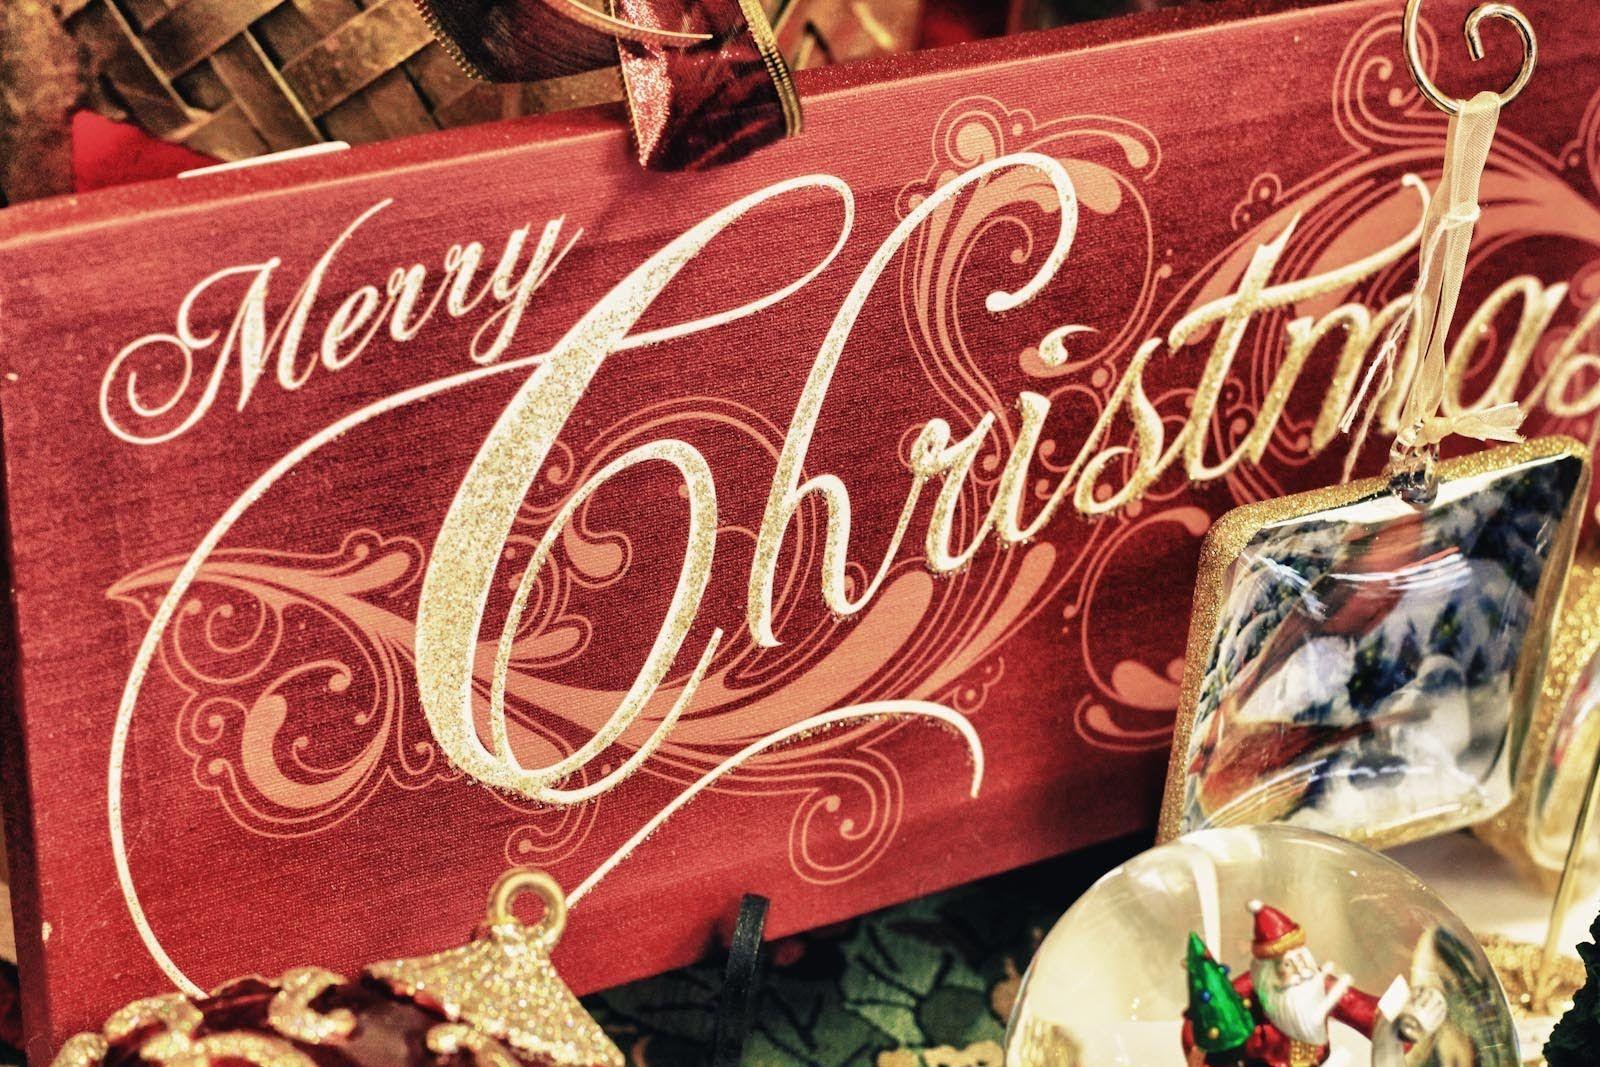 Christmas Music Youtube Playlist.Enjoy A 3 Hour Playlist Of Christmas Music With Holiday